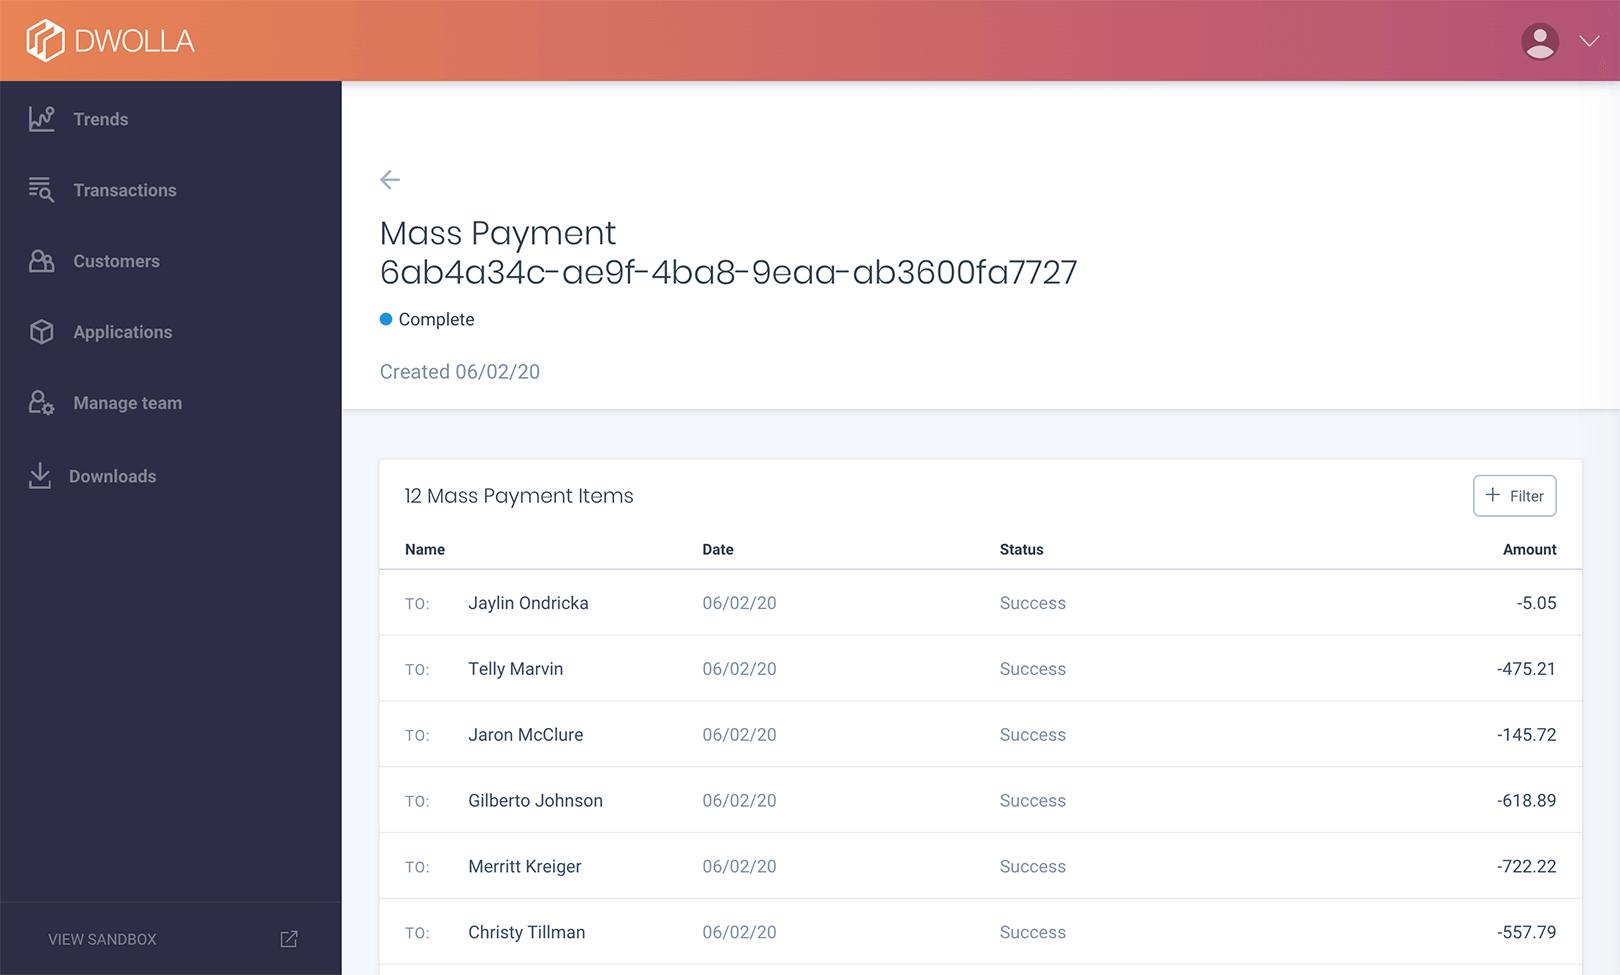 Mass Payment Detail Functionality Screenshot